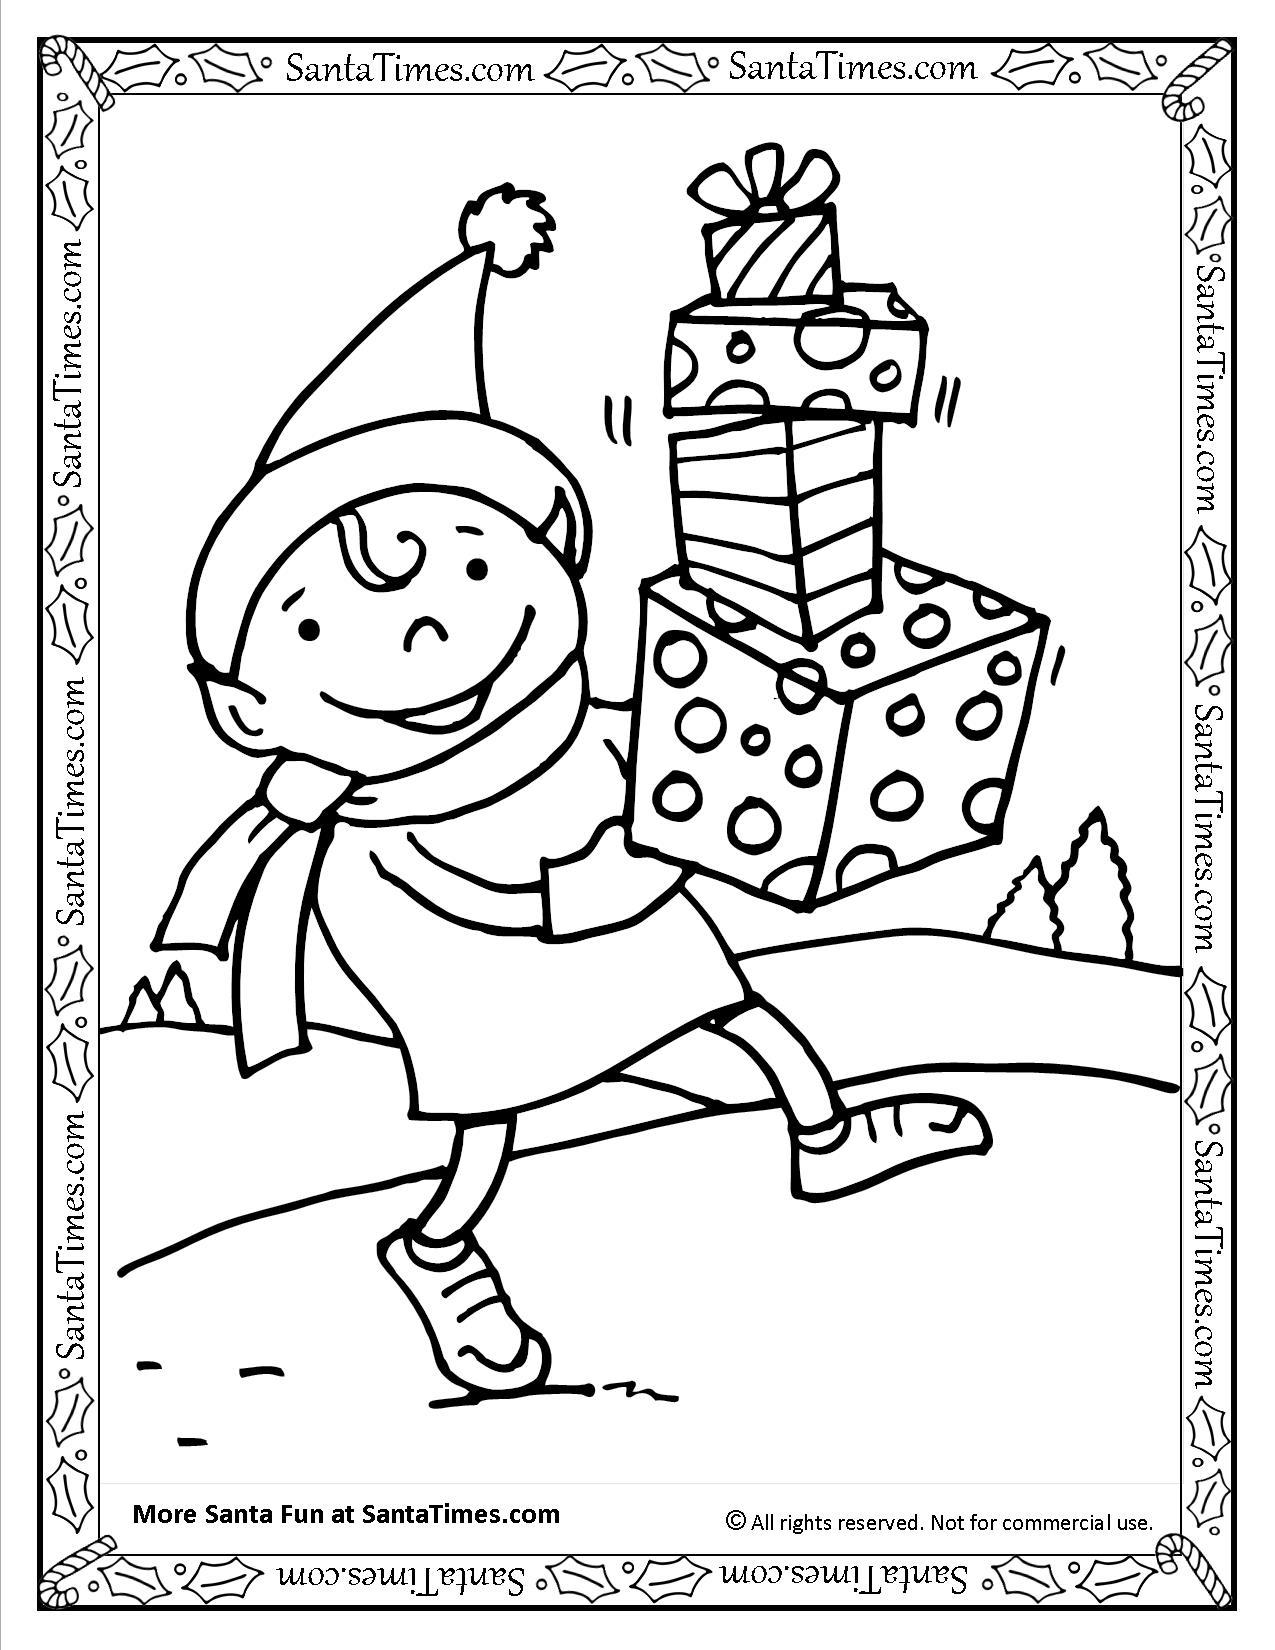 Elf Coloring Pages Printable Santas Elf Printable Coloring Page